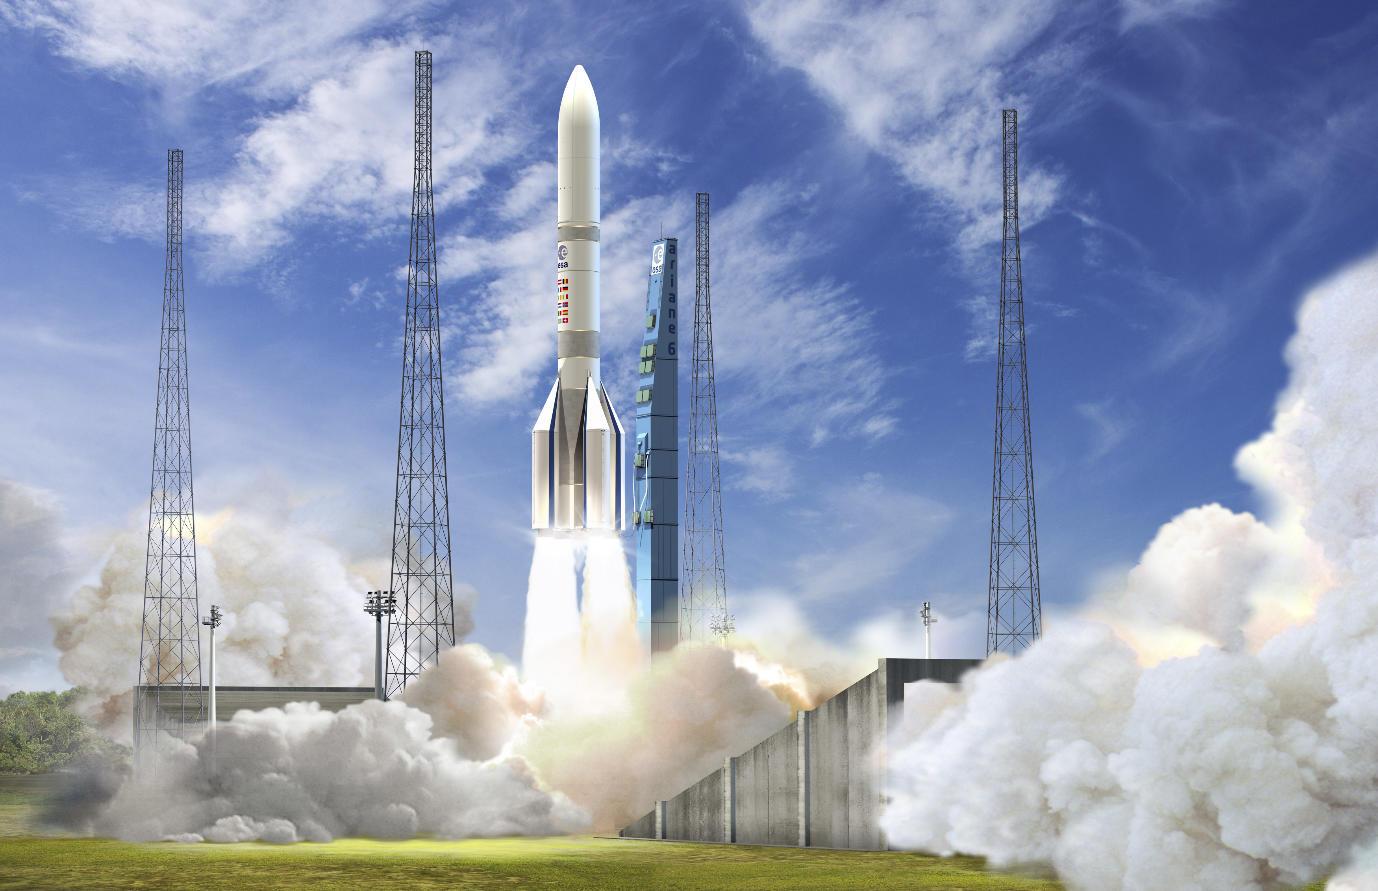 Full development go-ahead for Ariane 6, launch complex